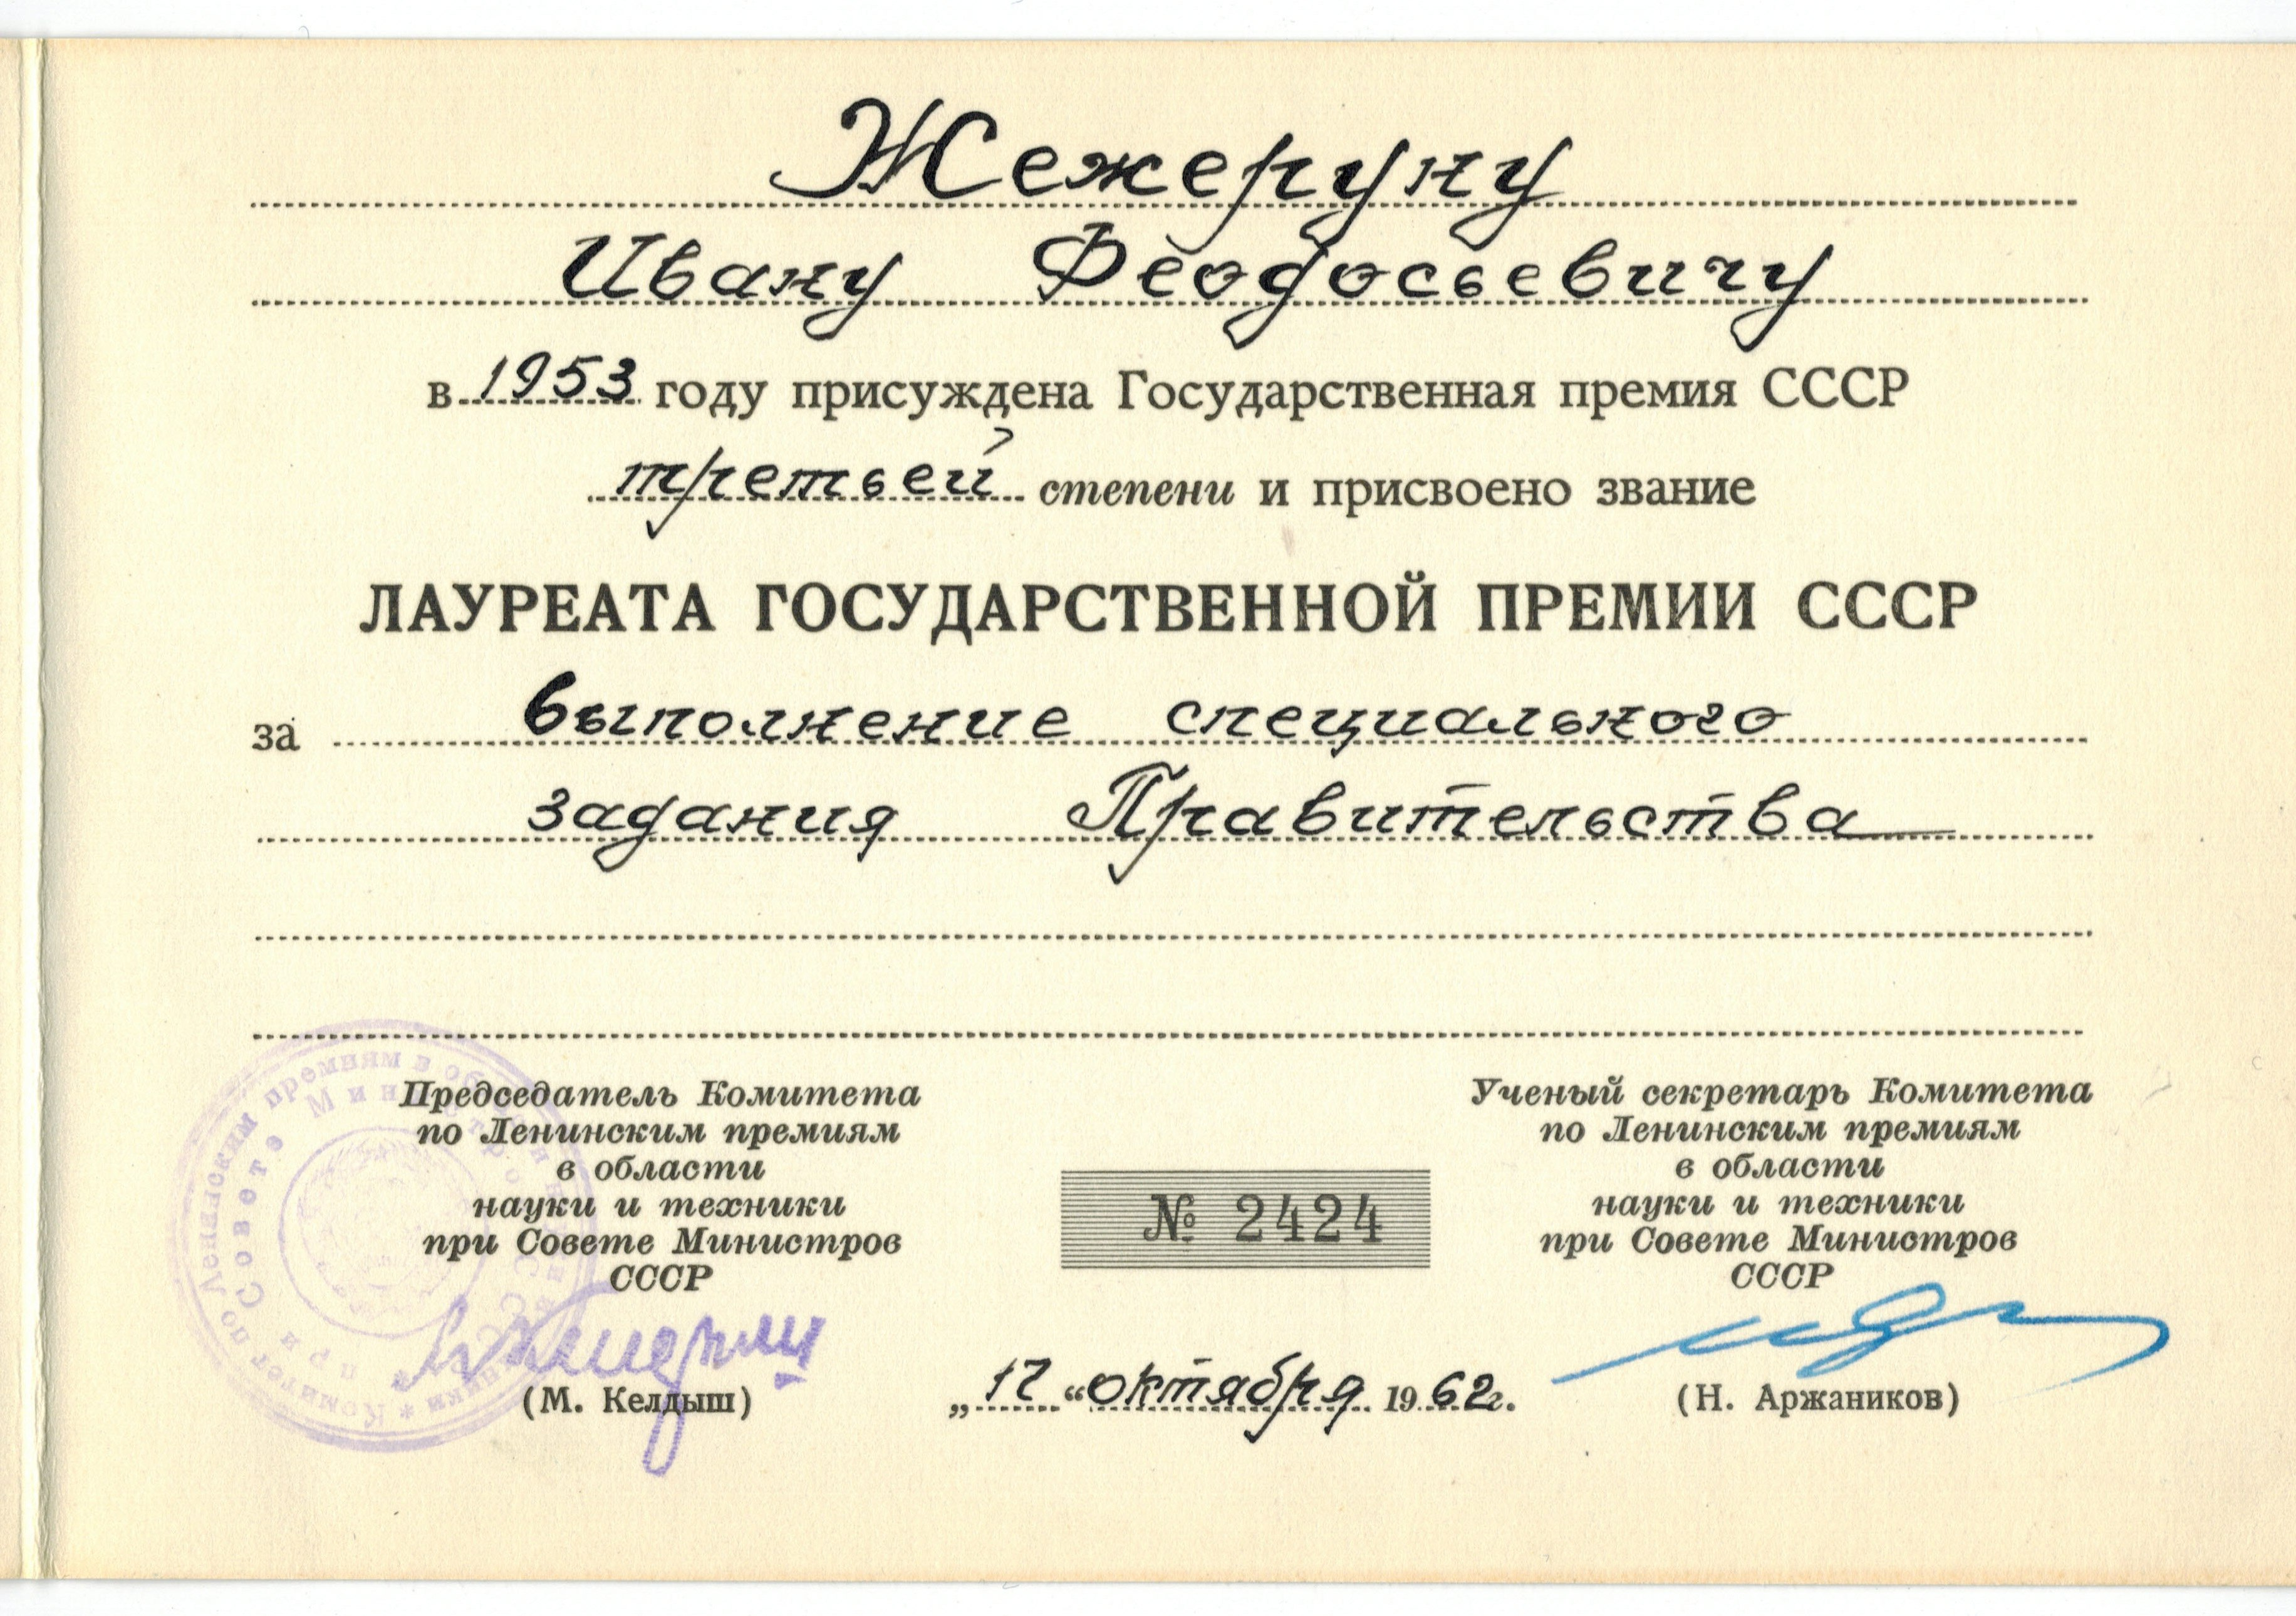 file Жежерун И Ф Диплом лауреата государственной премия СССР  file Жежерун И Ф Диплом лауреата государственной премия СССР 1953 г